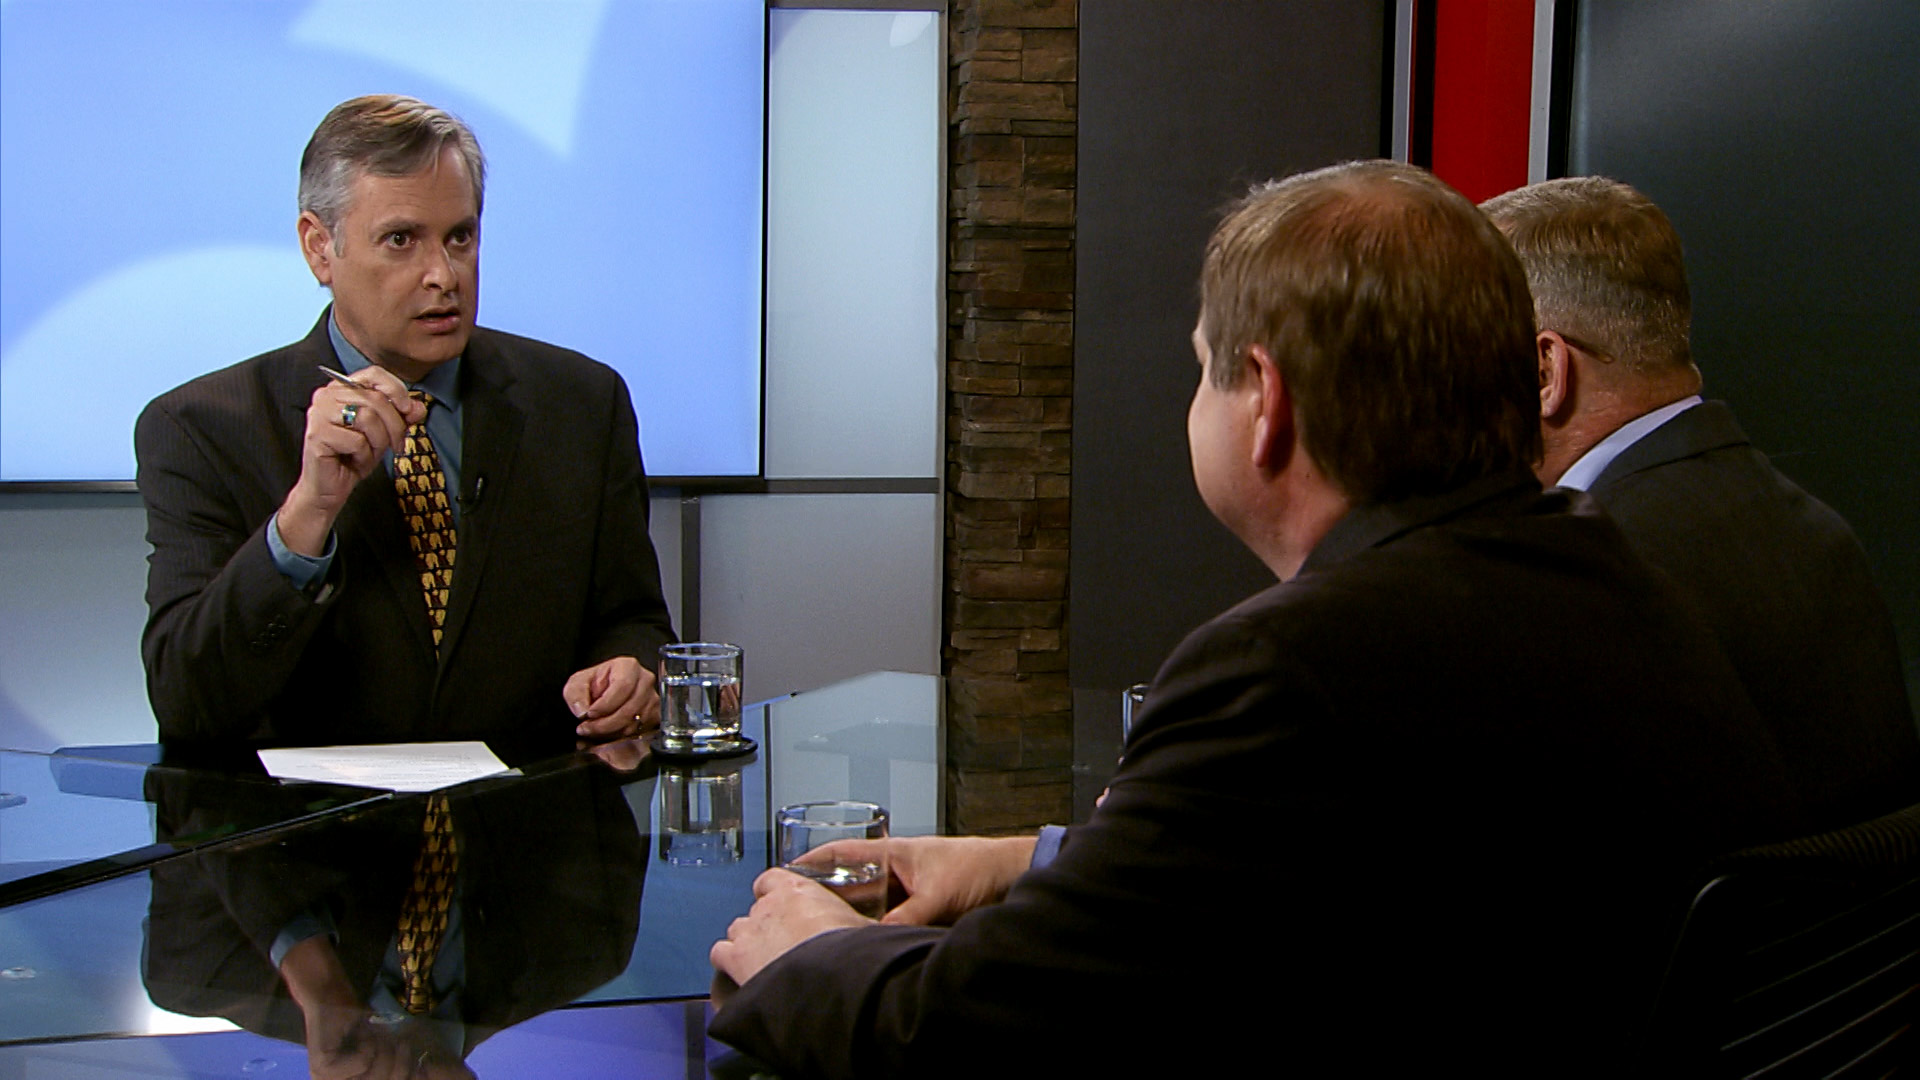 Christopher Conover interviews Jim Nintzel and James Kelley in the Arizona 360 studio.